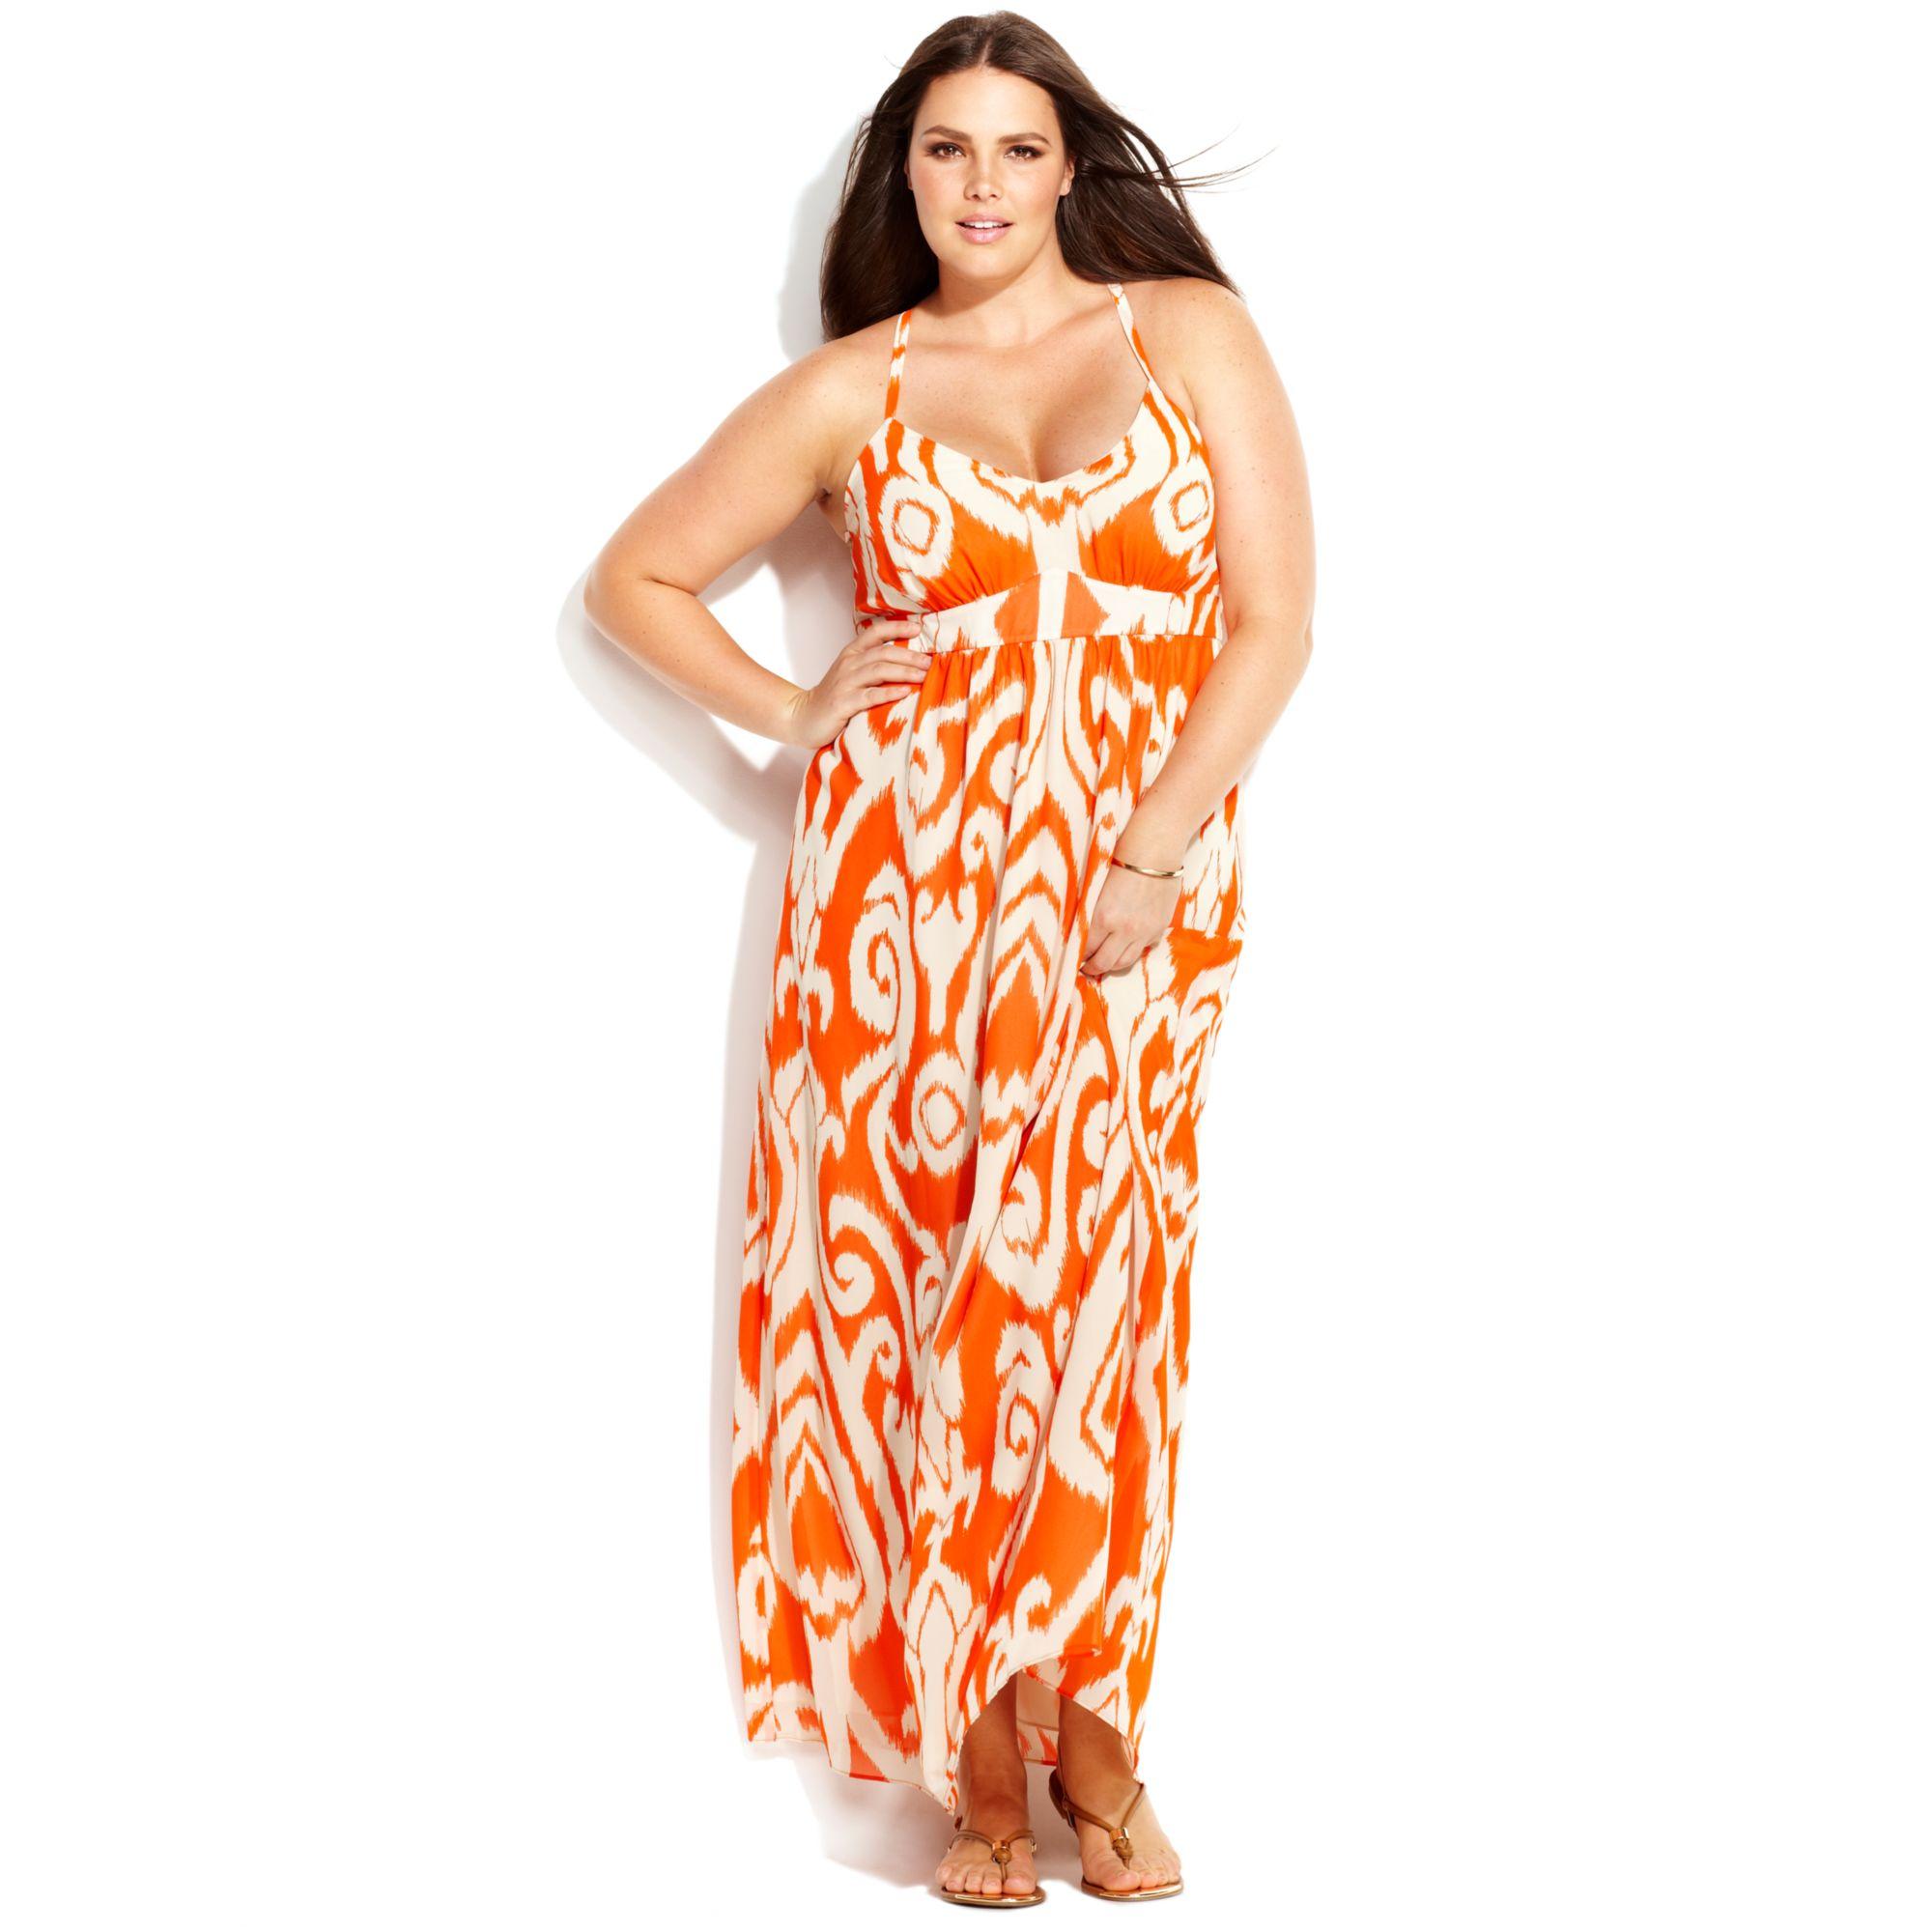 INC International Concepts Orange Plus Size Sleeveless Printed Maxi Dress